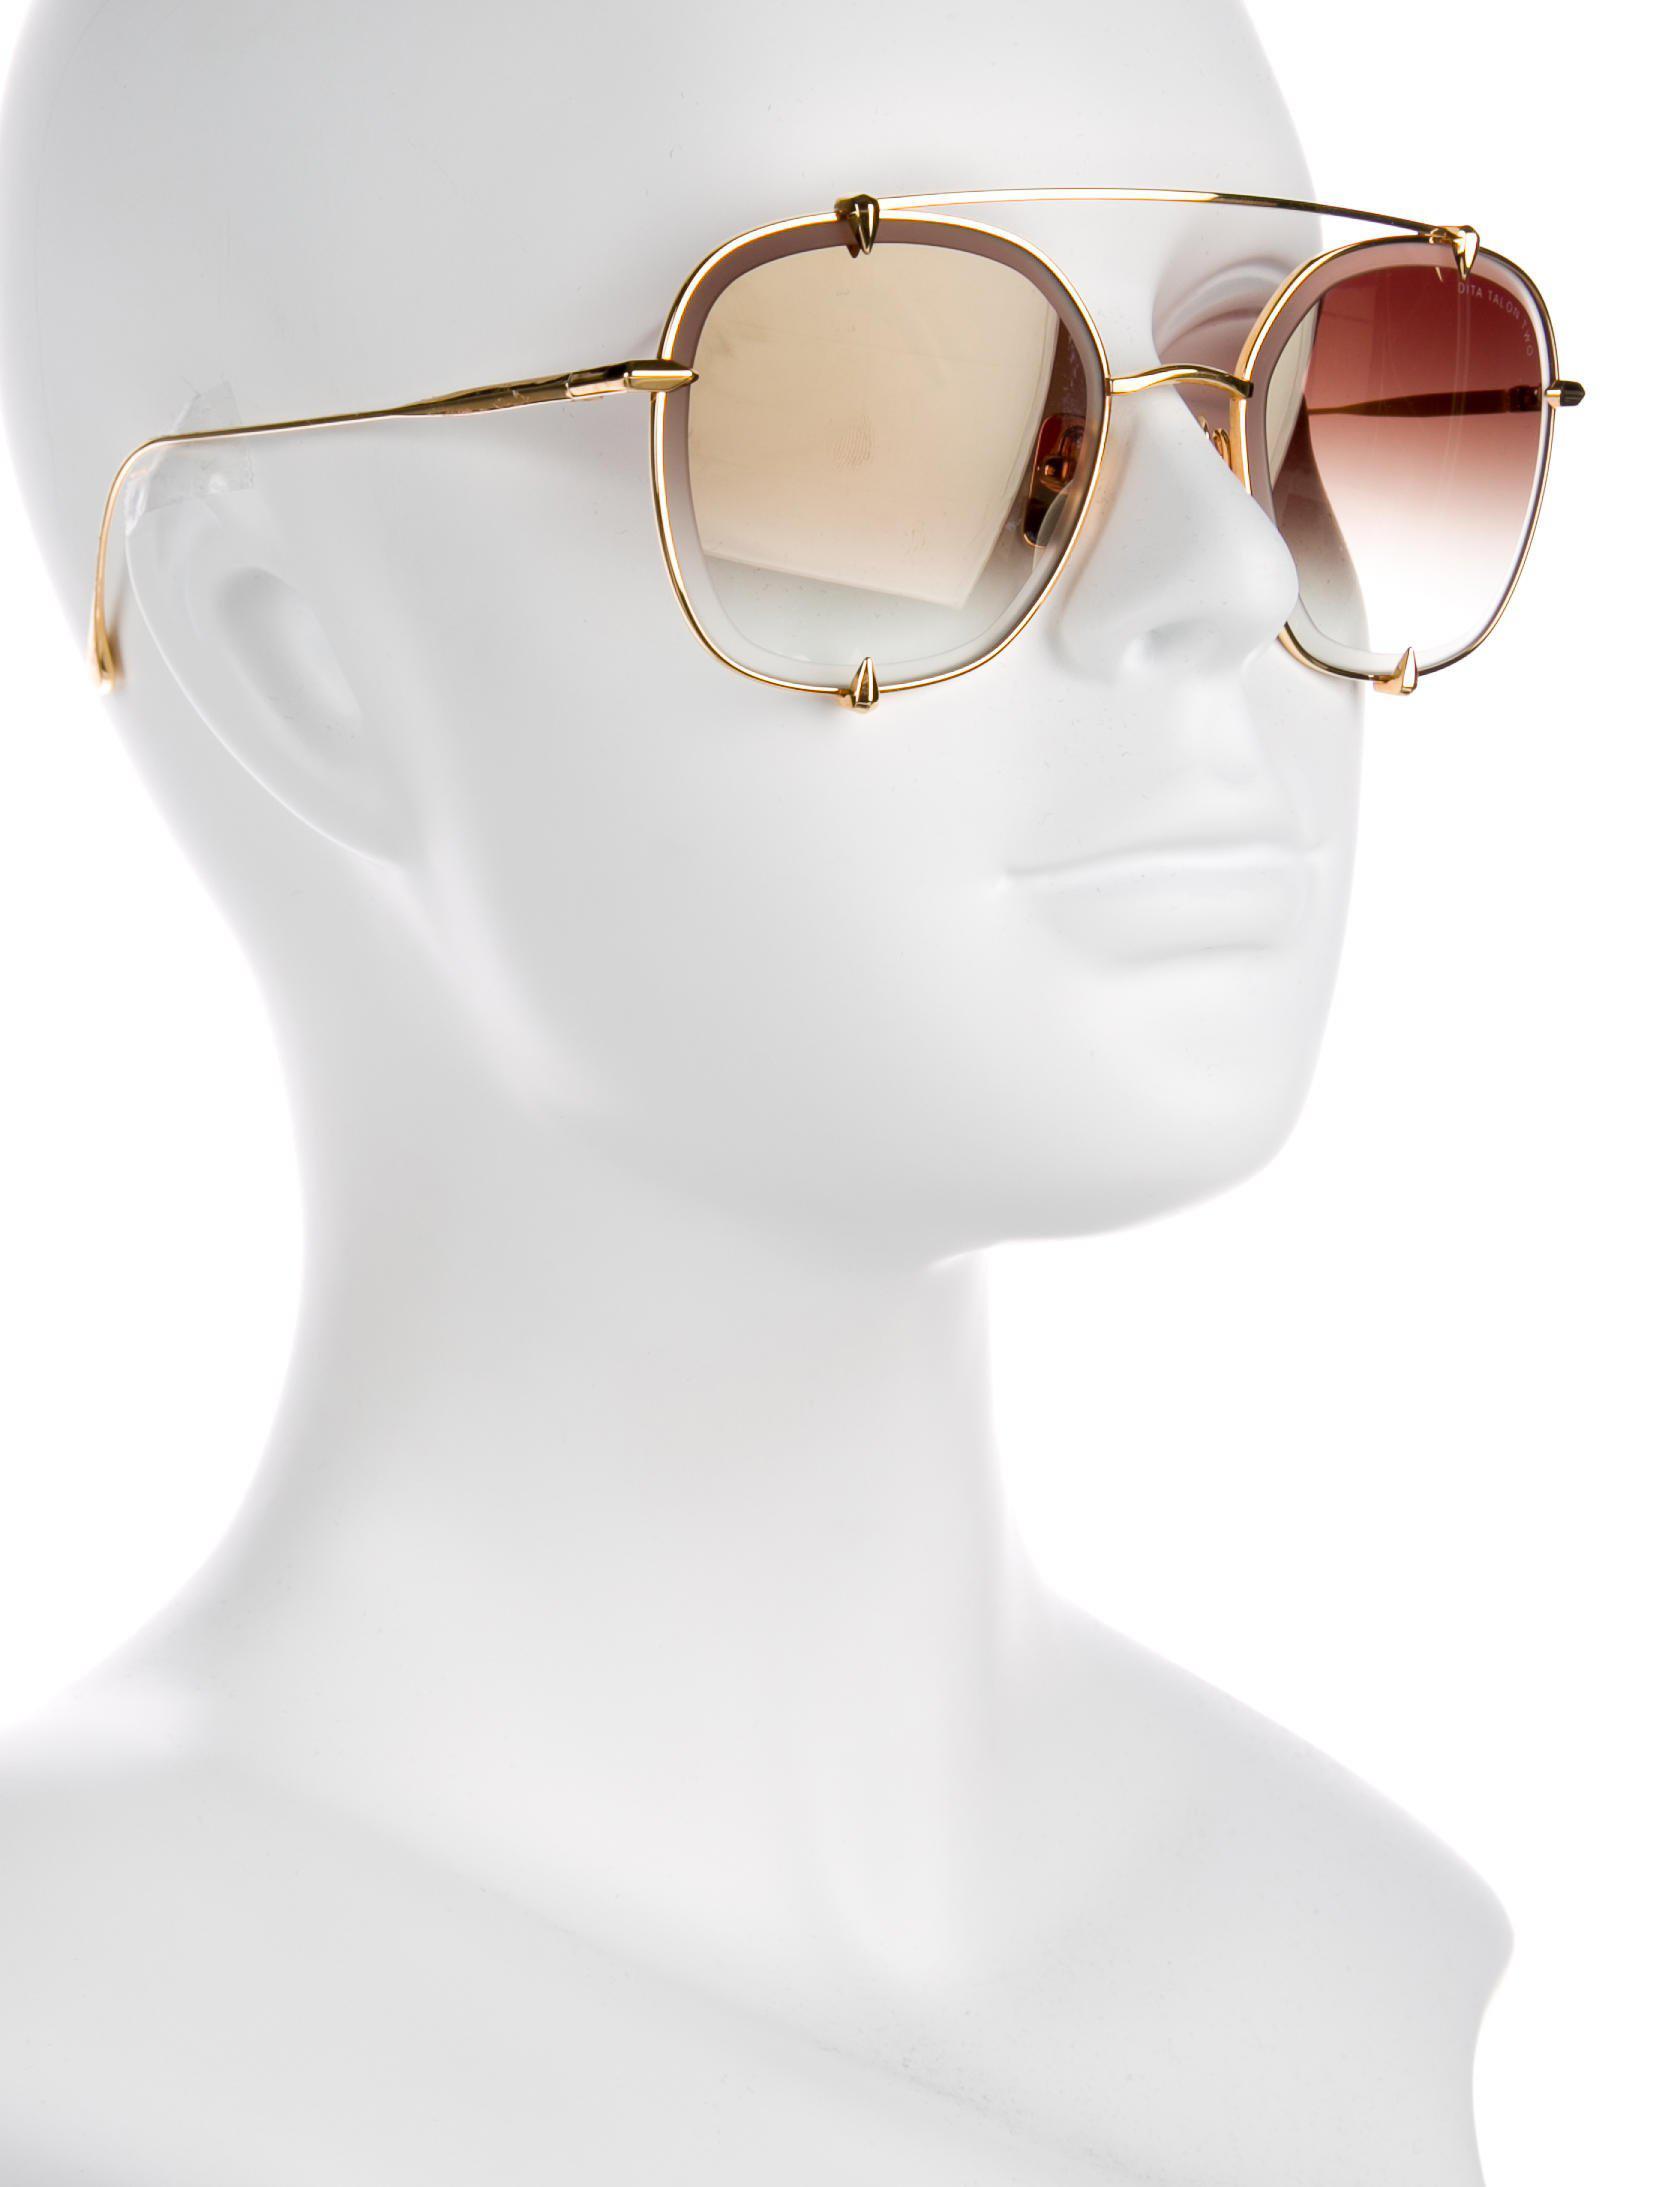 ad5a825739af Dita - Metallic Talon Two Gradient Sunglasses Gold for Men - Lyst. View  fullscreen